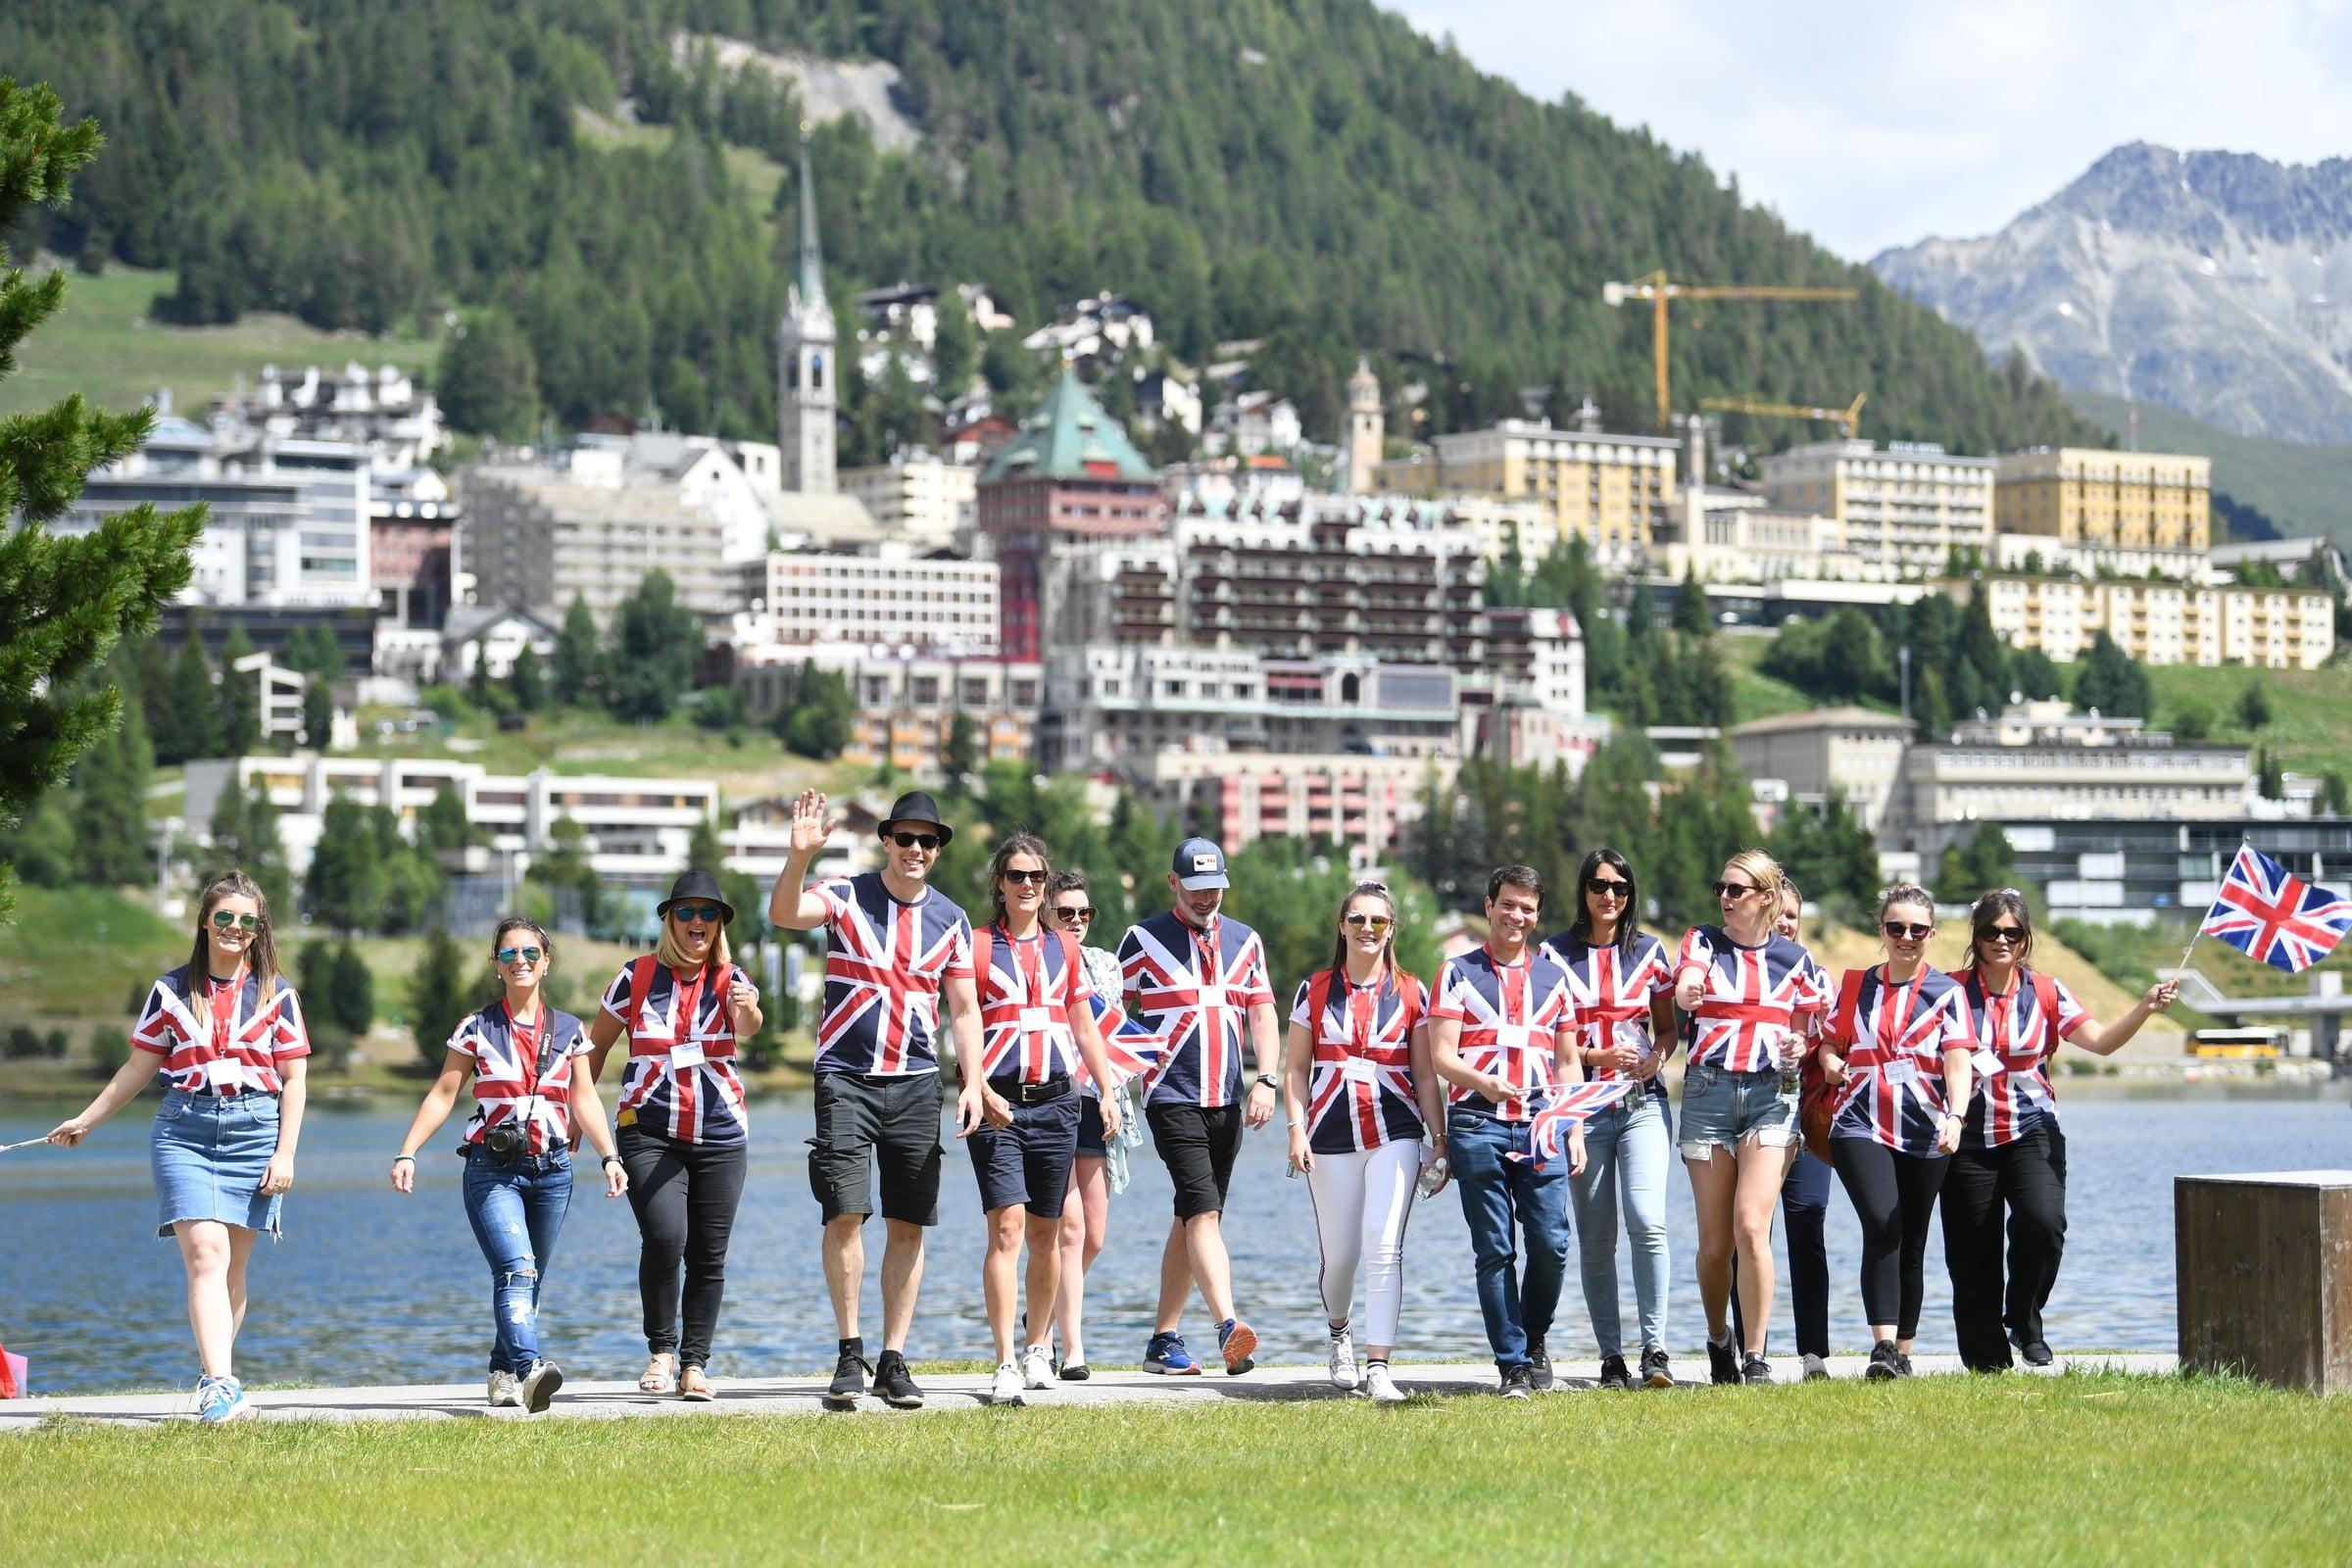 The St. Moritz Experience AG